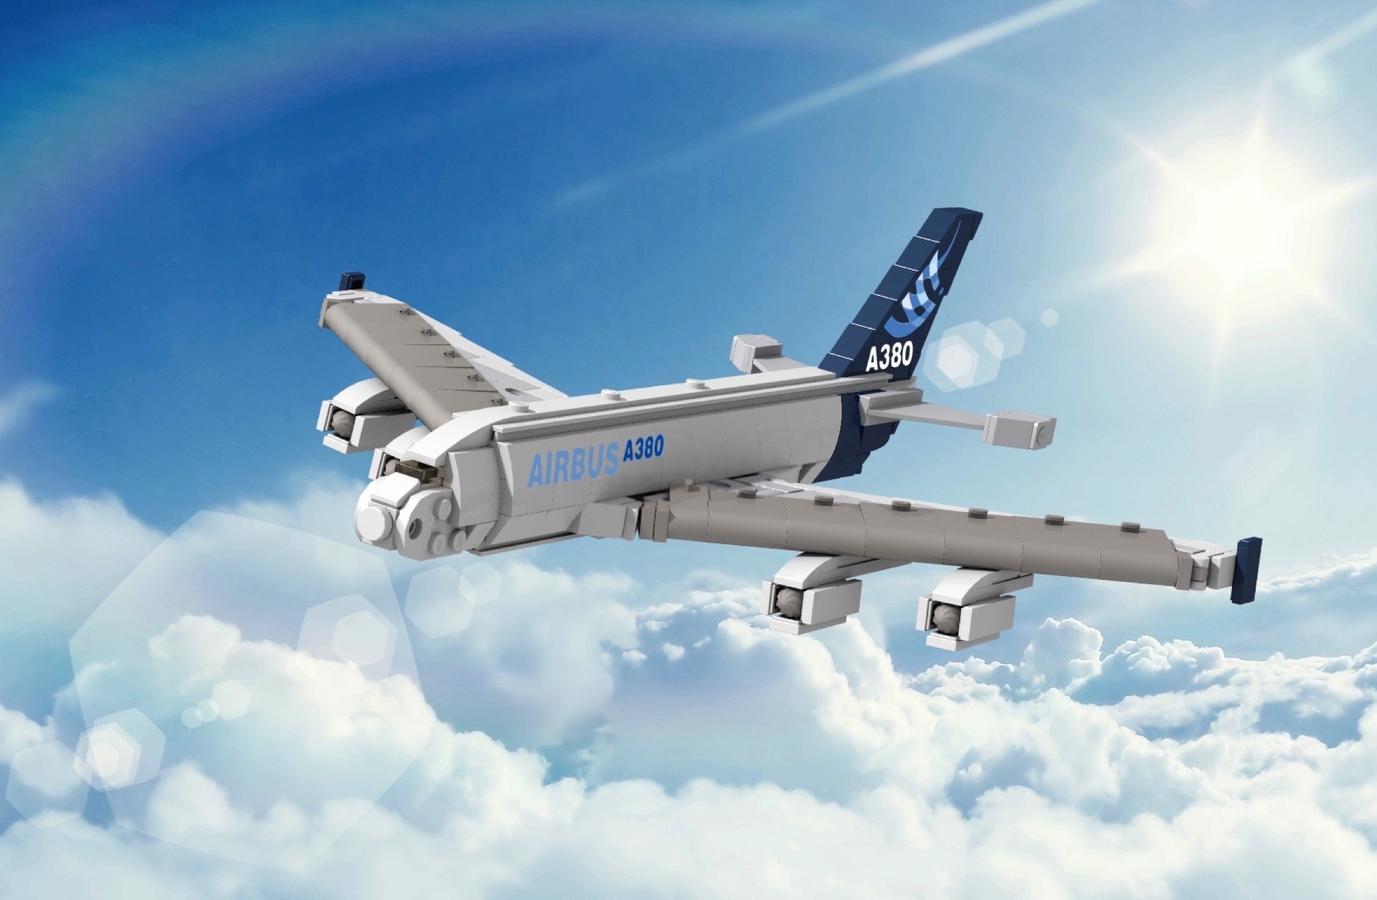 Lego Ideas Product Ideas Airbus A380